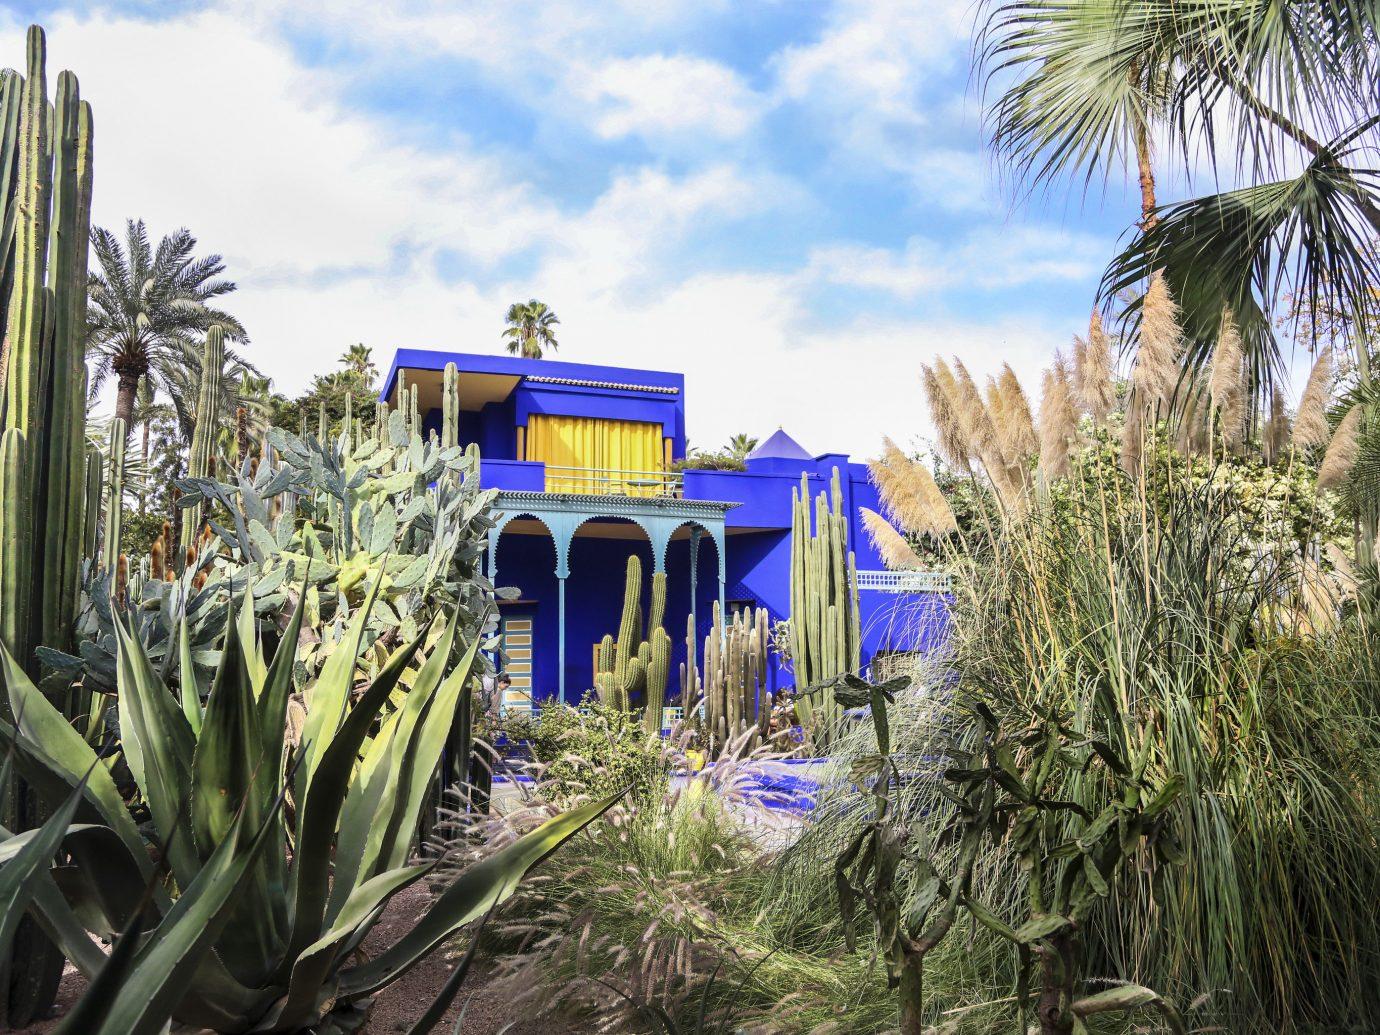 Arts + Culture Marrakech Morocco Style + Design plant majorelle blue arecales tree palm tree sky real estate grass landscape house